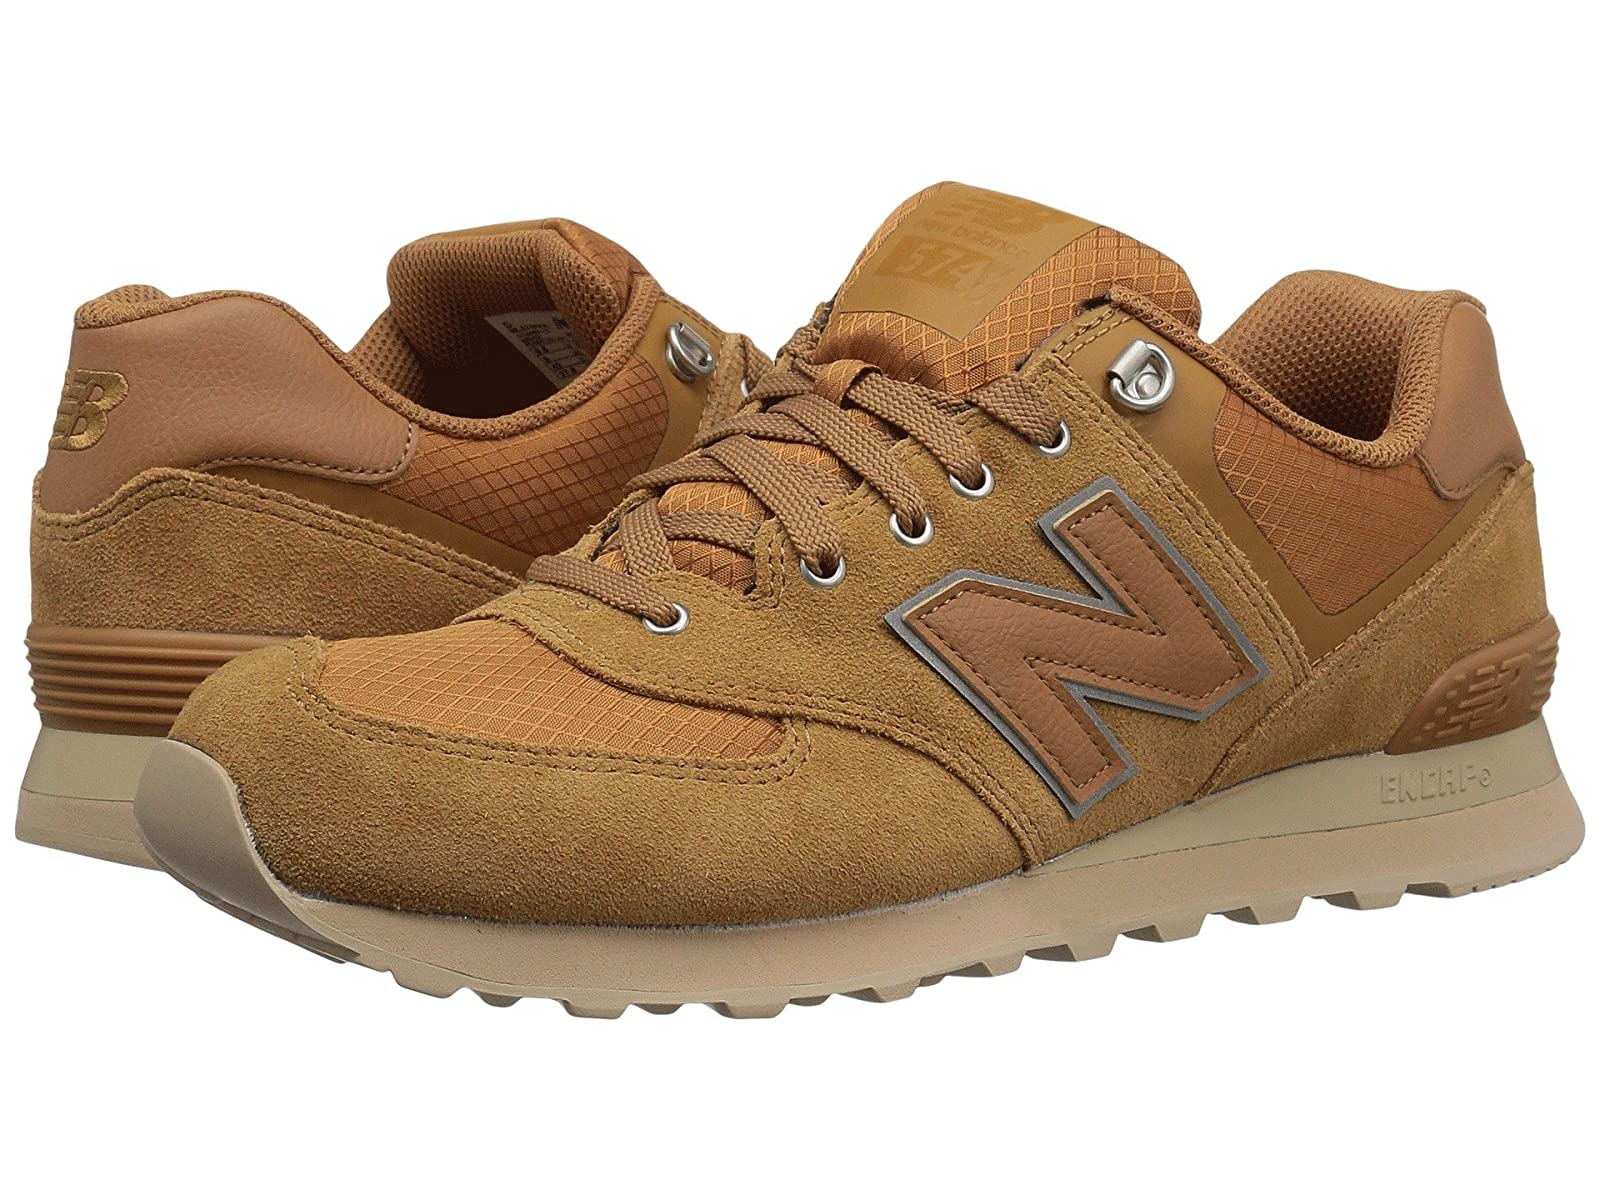 New Balance Classics ML574v1Cheap and distinctive eye-catching shoes